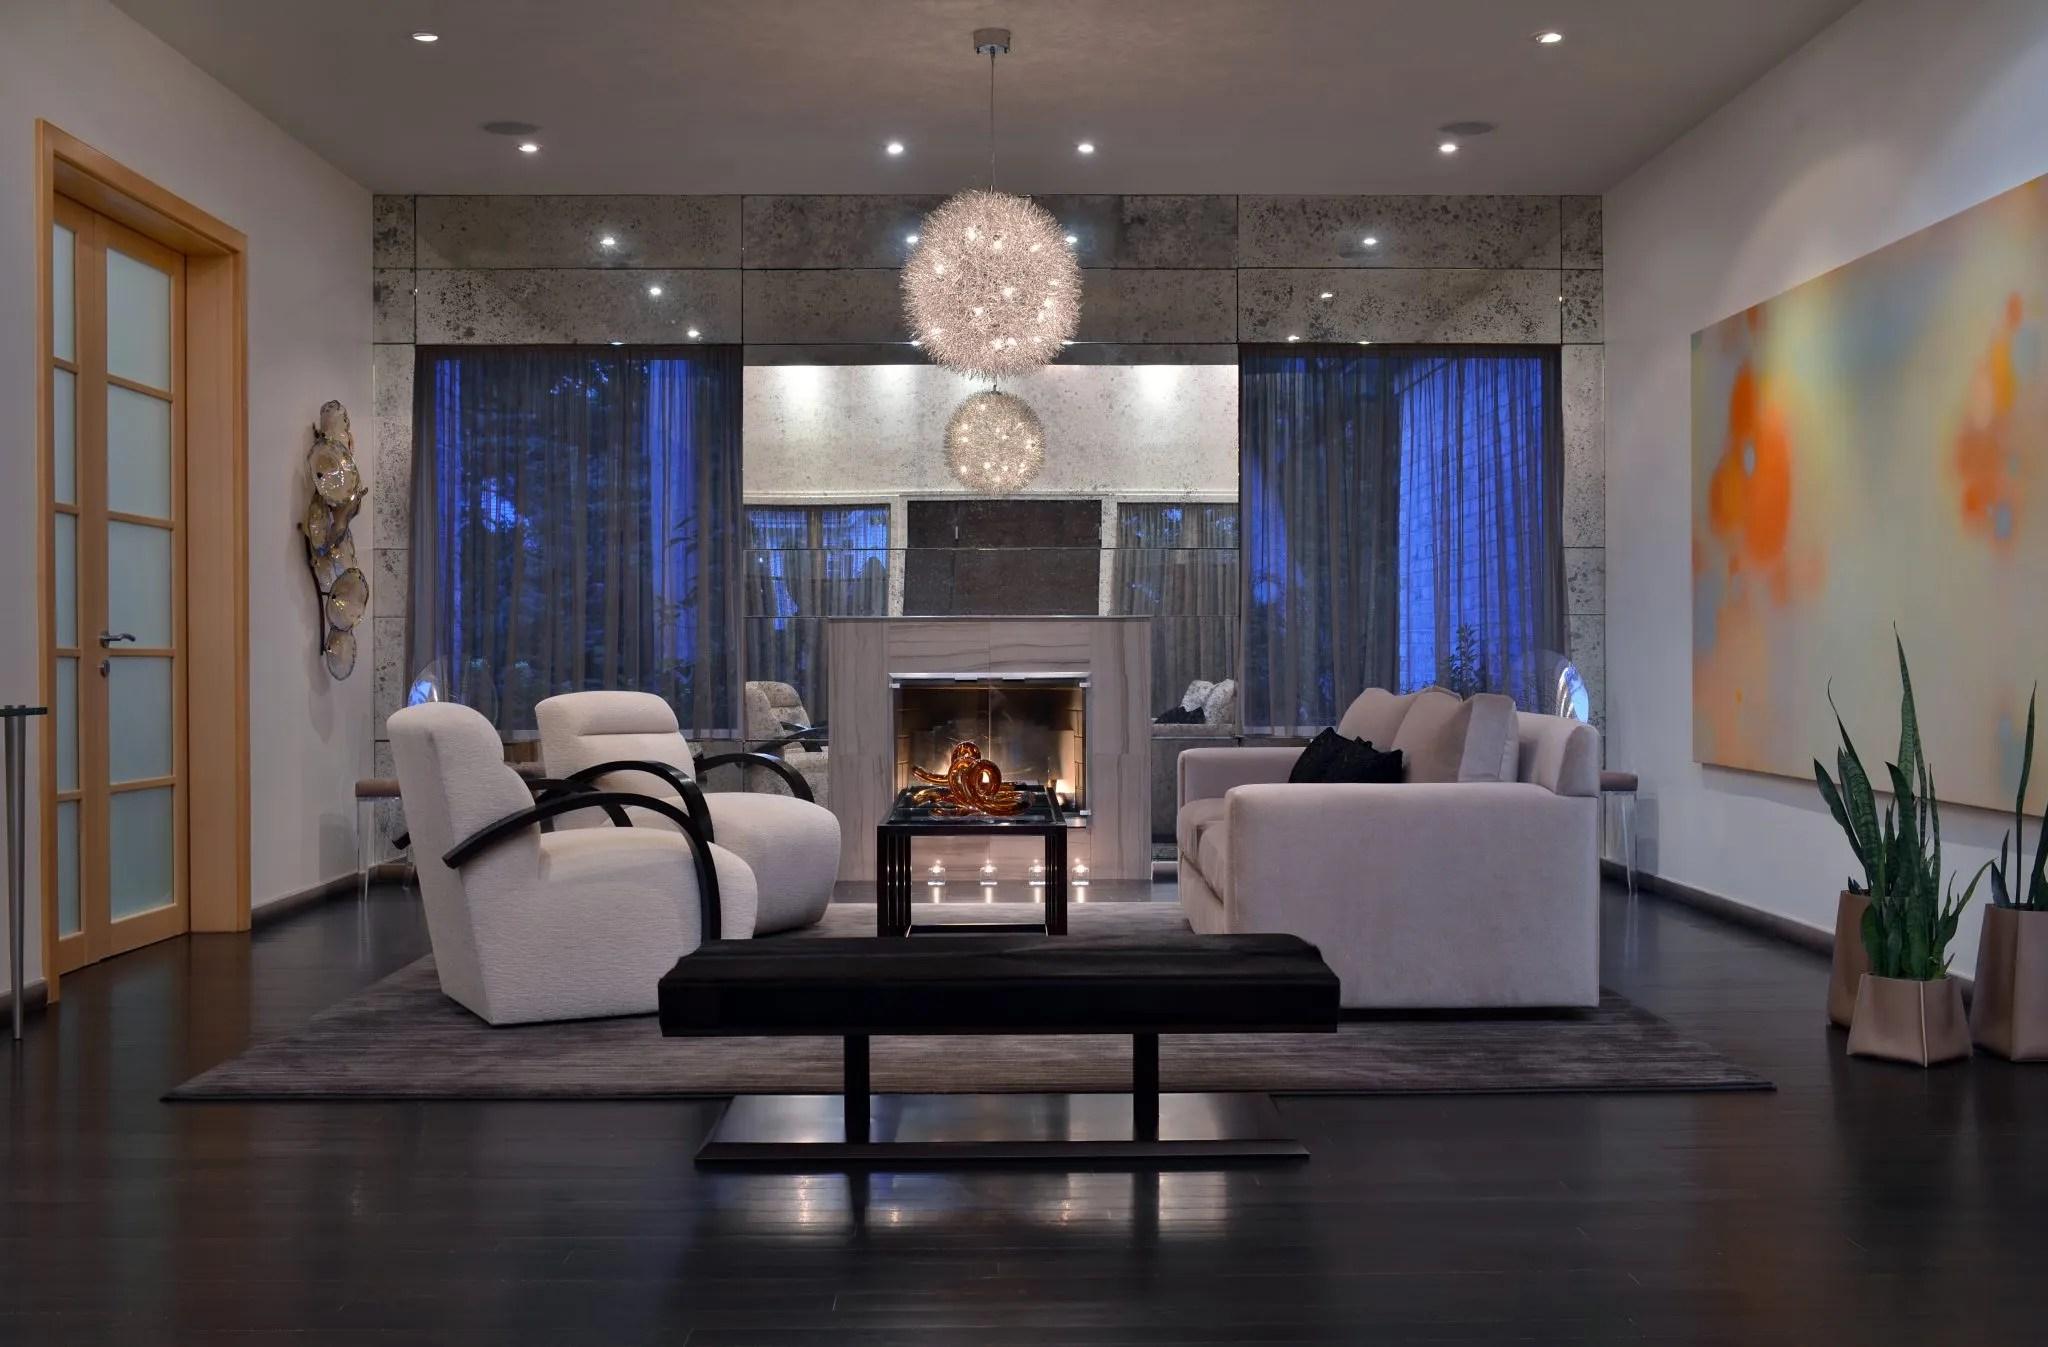 interior style hunter interviews interior designer keith baltimore rh interiorstylehunter com baltimore interior design stores keith baltimore interior design